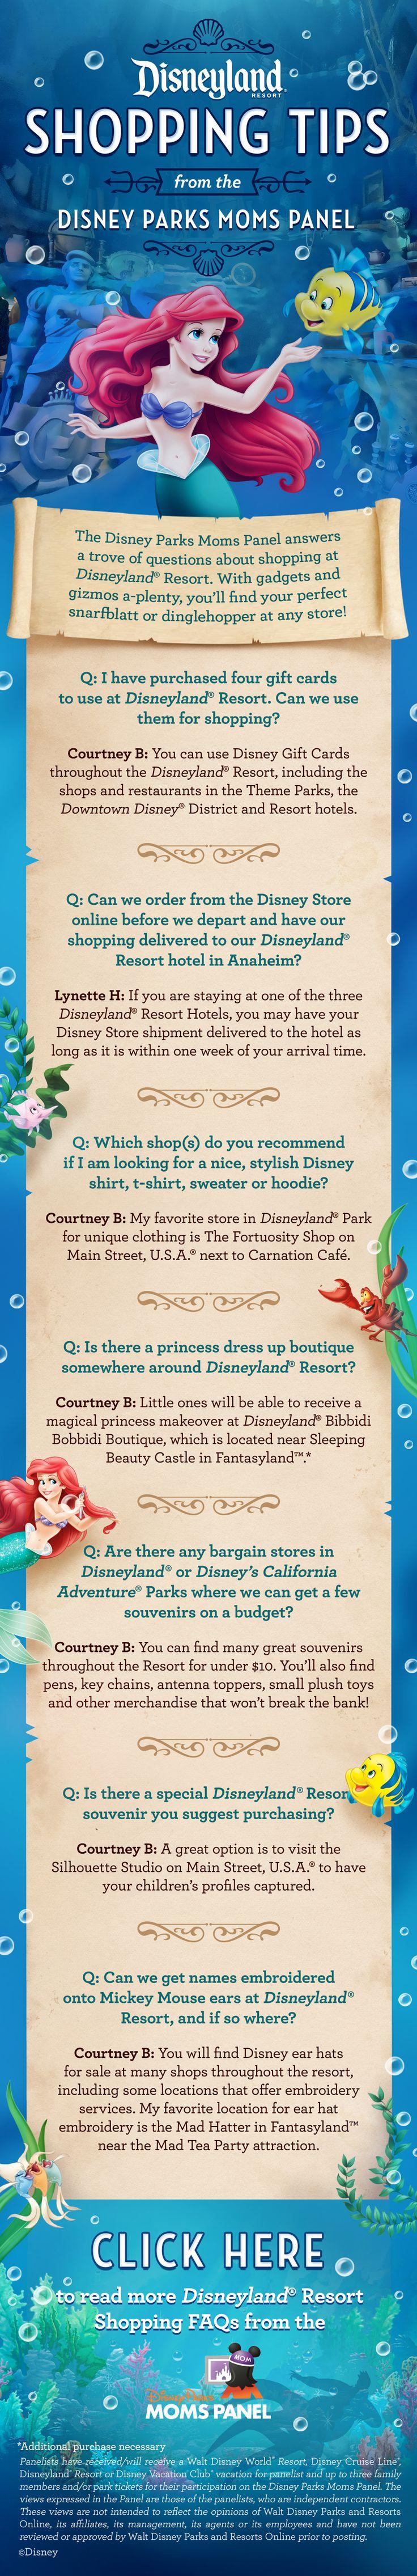 Disneyland shopping tips from the Disney Parks Moms Panel.